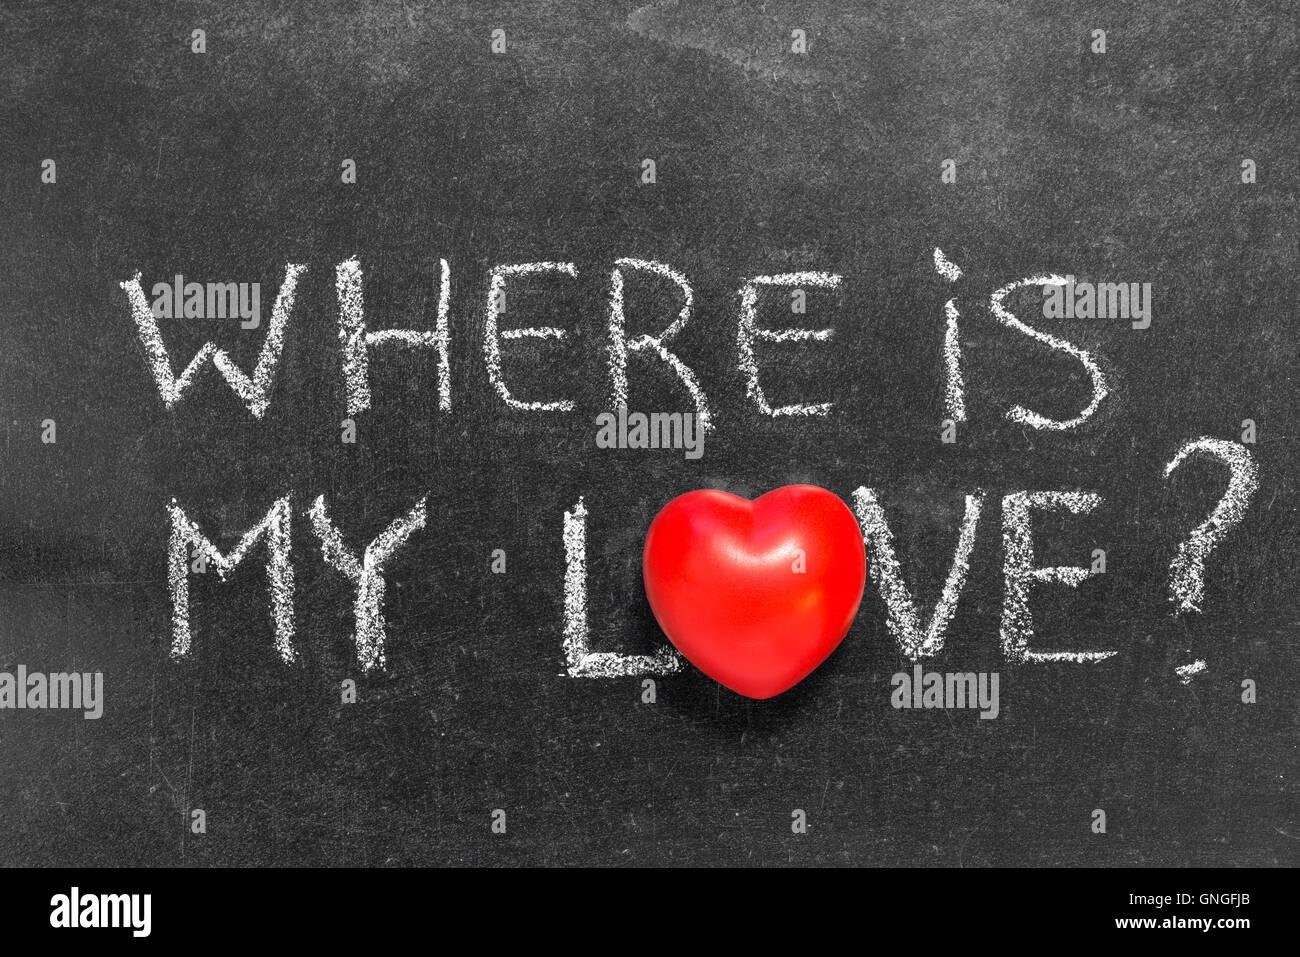 Where is my love question handwritten on chalkboard with red heart where is my love question handwritten on chalkboard with red heart symbol instead of o biocorpaavc